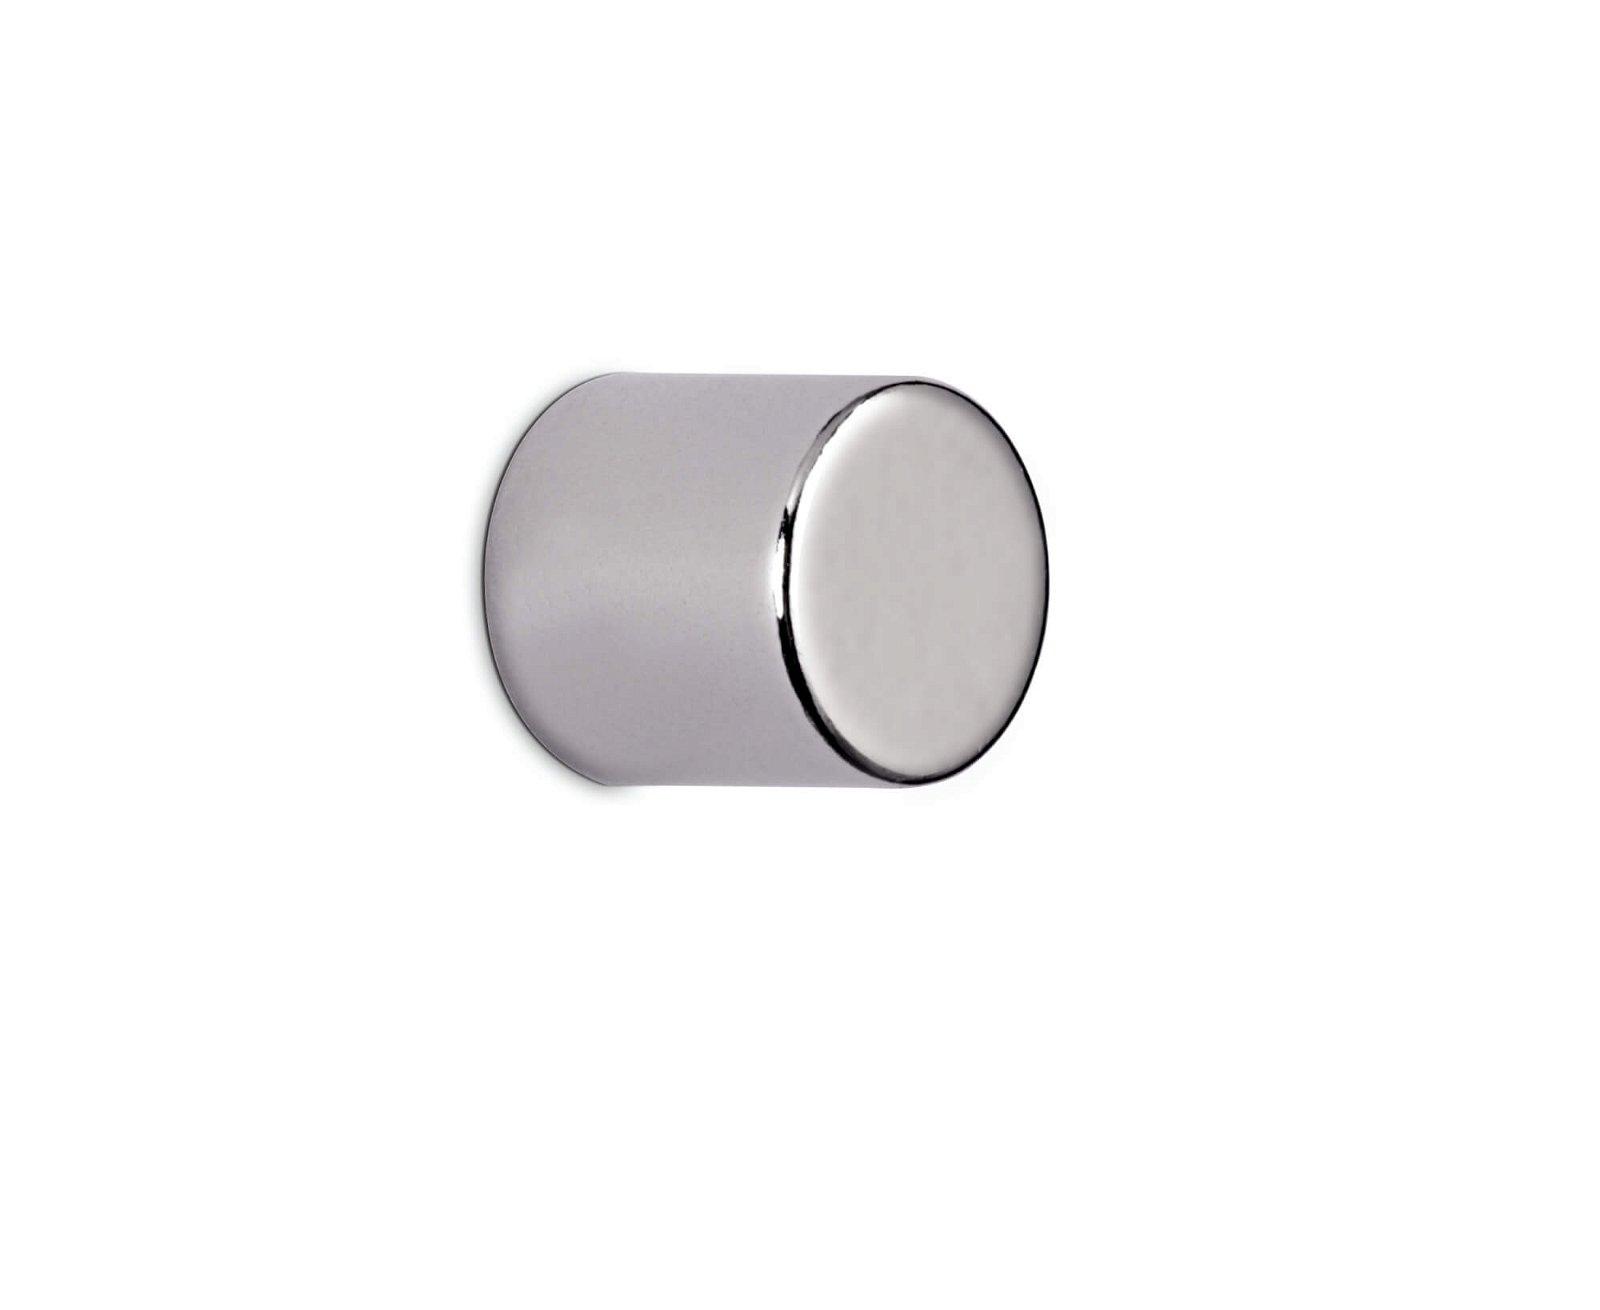 Neodym-Zylindermagnet,10x10 mm  4 kg Haftkraft, 4 St./Set, hellsilber